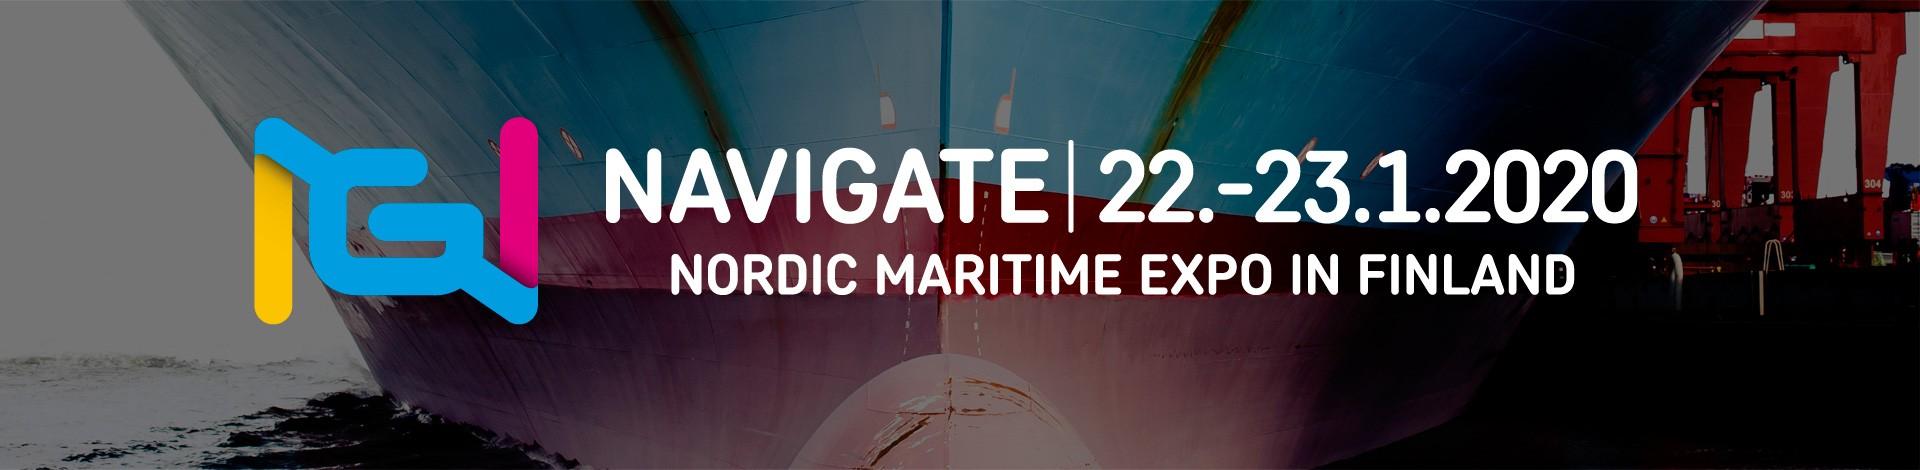 Navigate-1920x470px_tammikuu